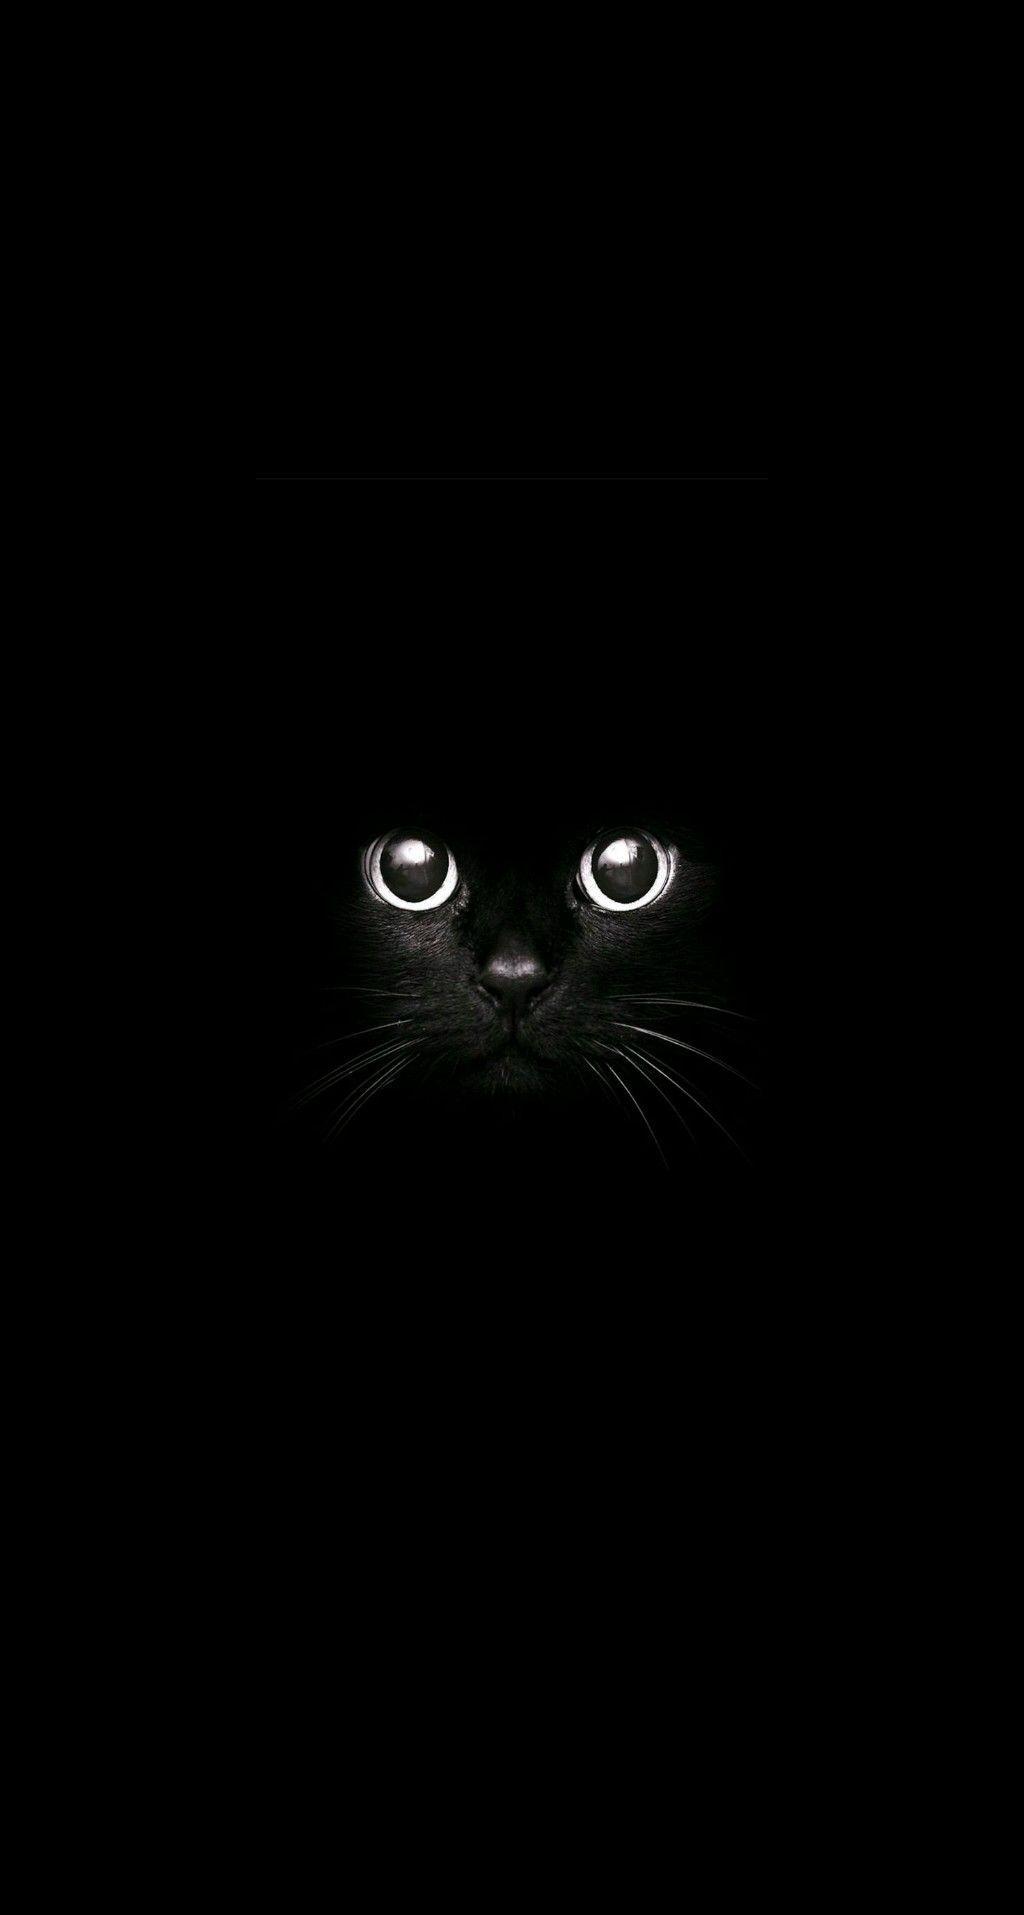 Pin By Brigitte Bachmeier On Shoes In 2020 Black Cat Art Cat Wallpaper Cat Photography